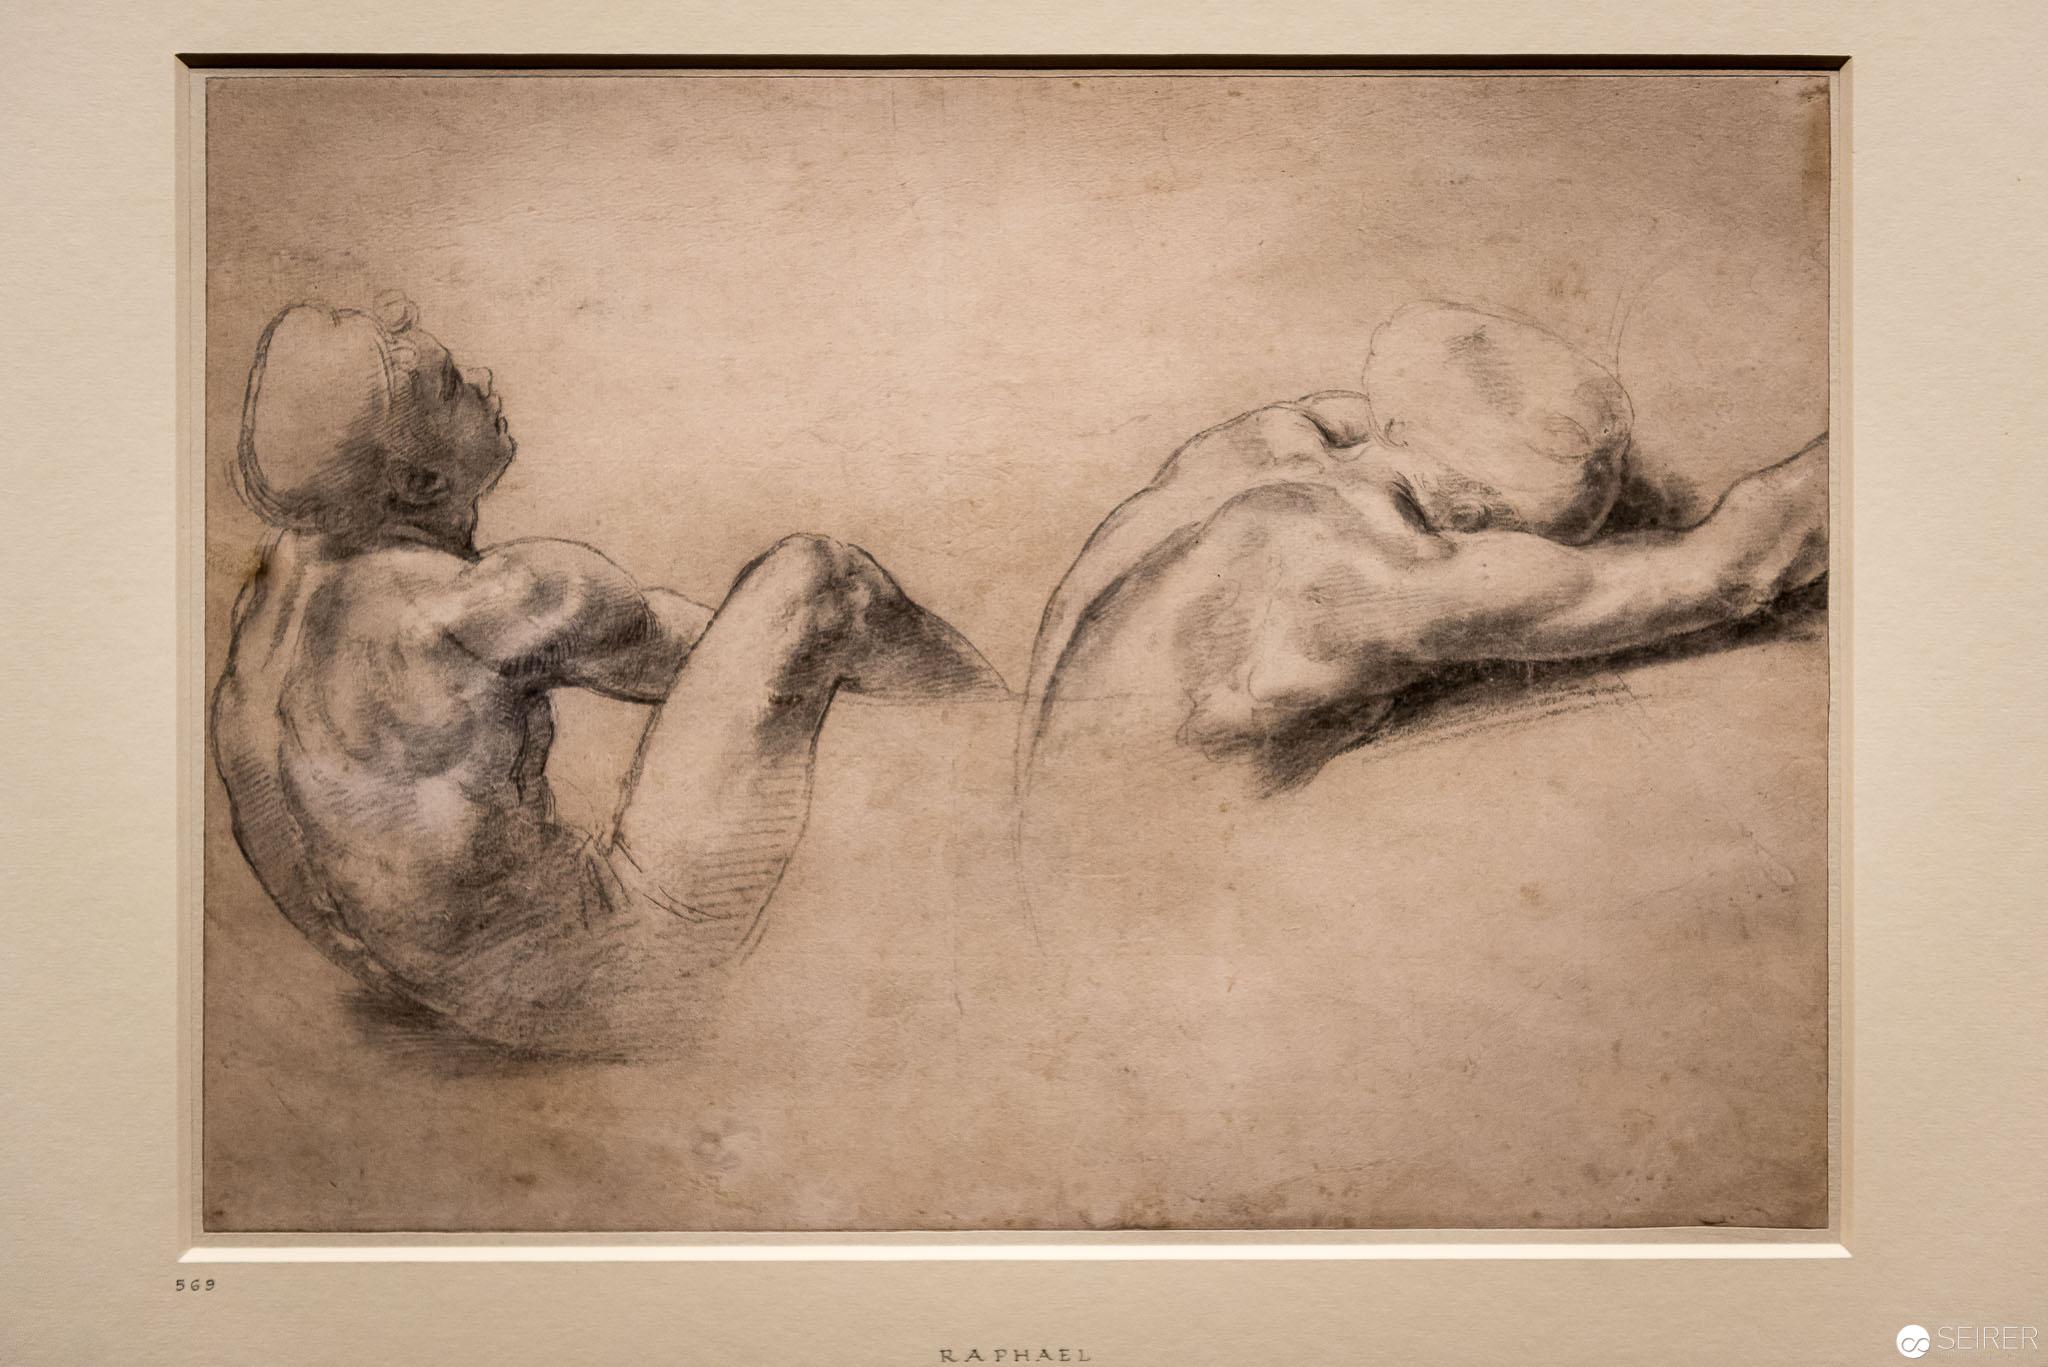 Raffael: Aktstudie zweier sitzenden Jünglinge, Ashmolean Museum Oxford